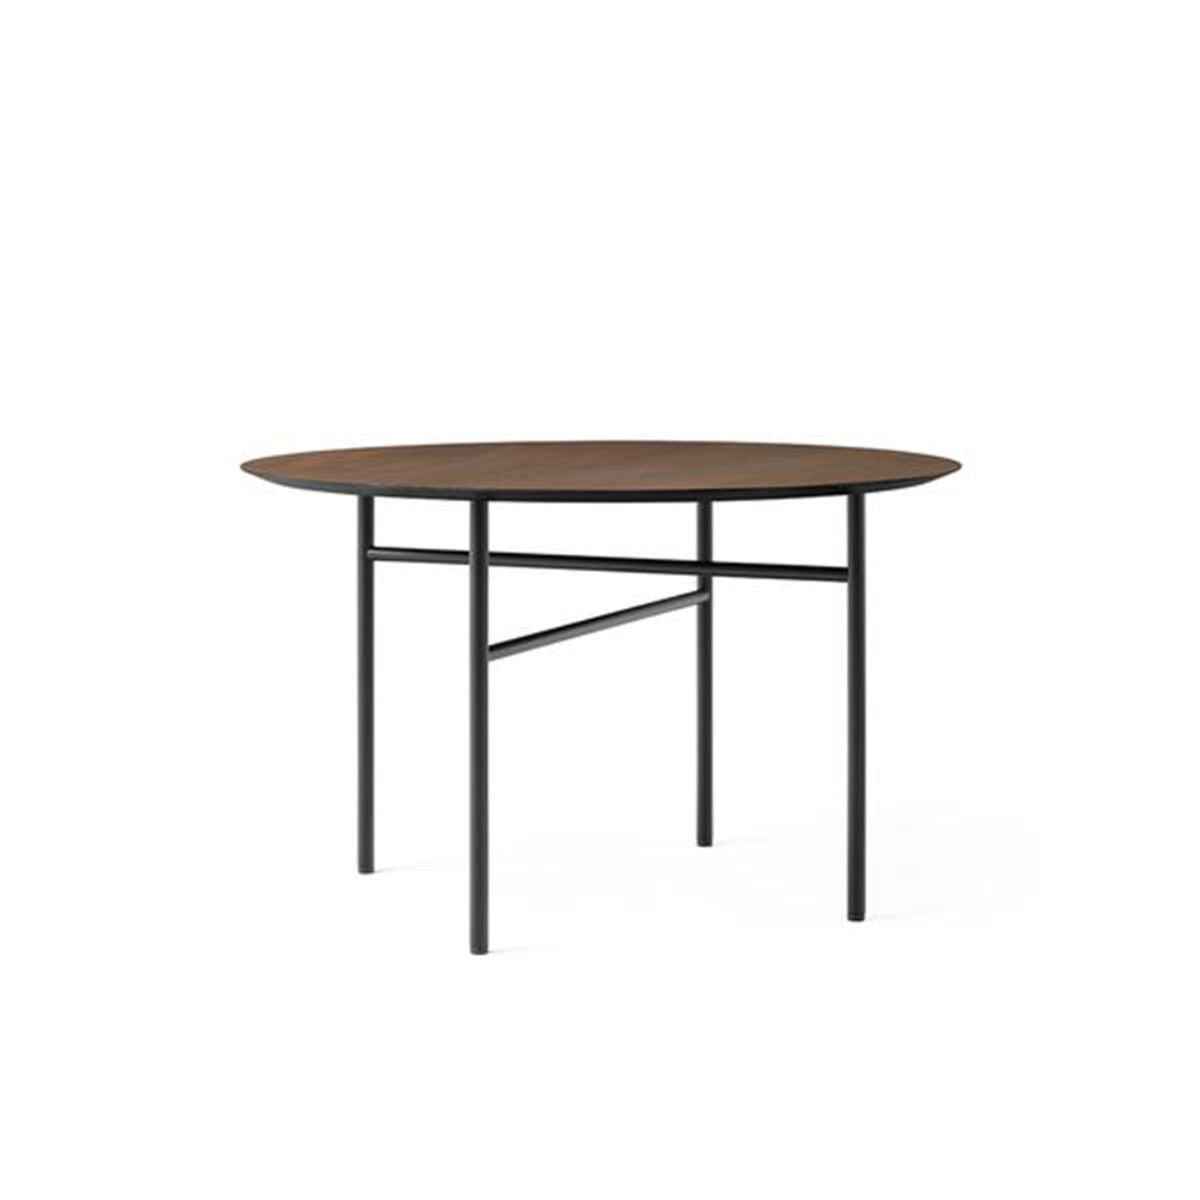 Snaregade Dining Table, Round Ø120, Black/Dark Stained Oak